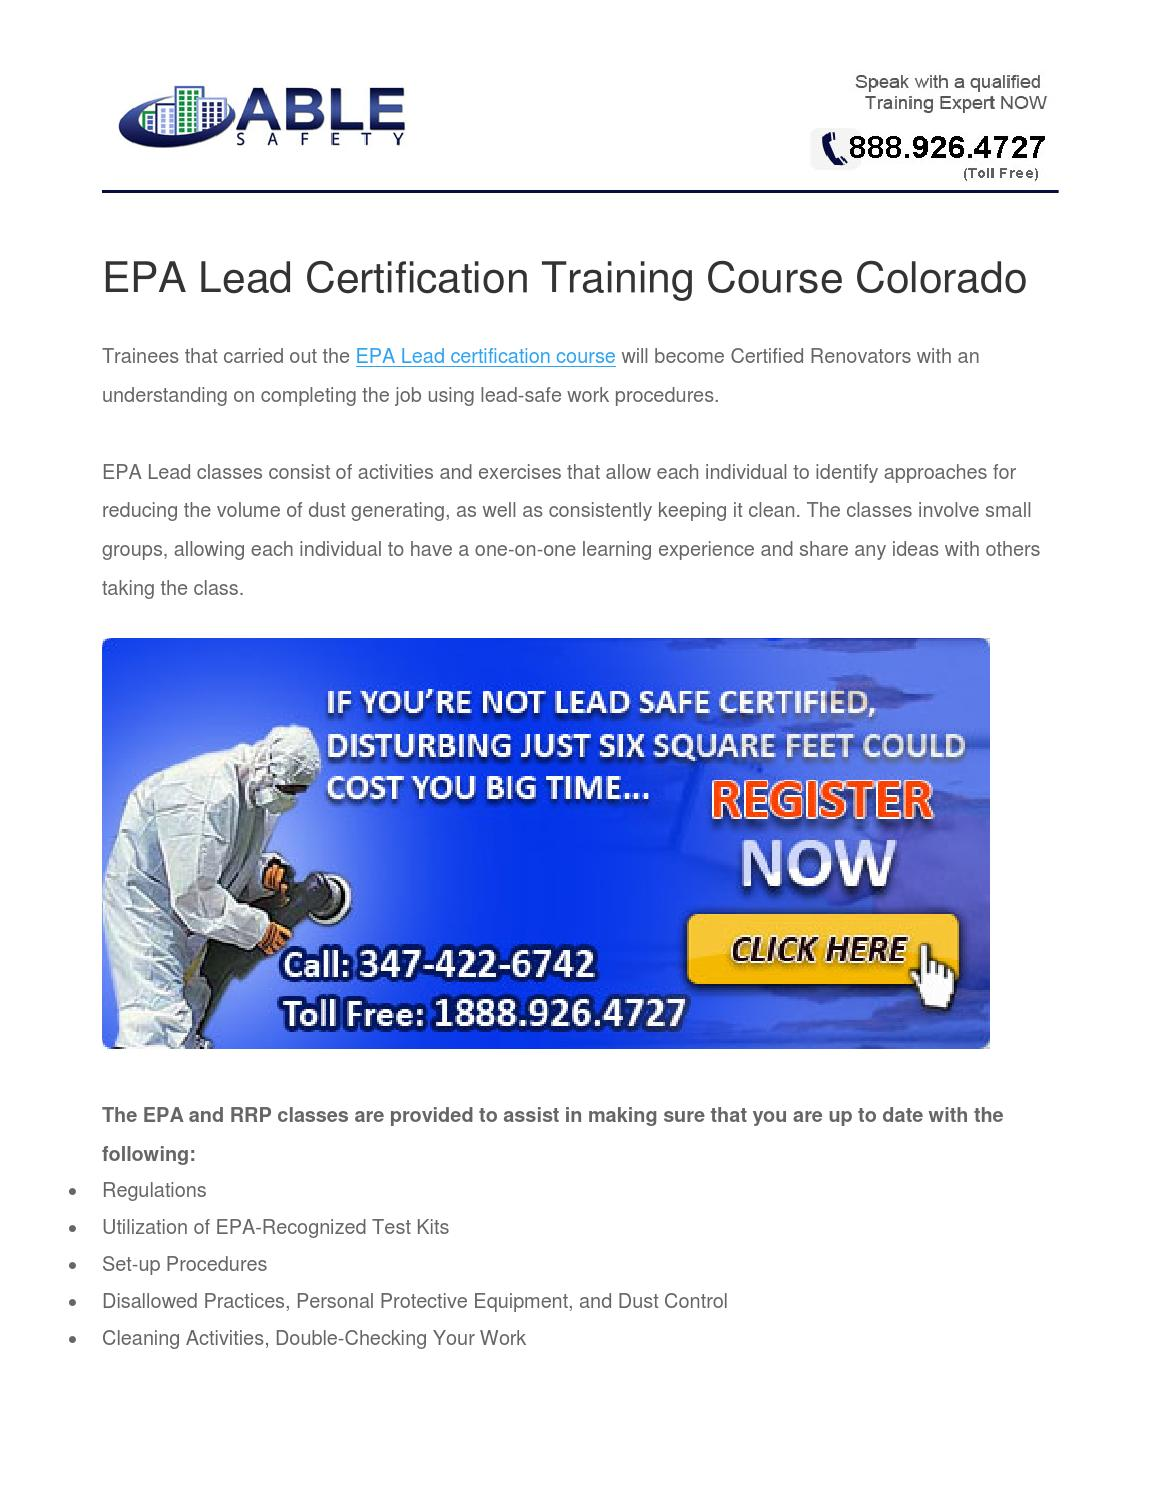 lead certification epa training